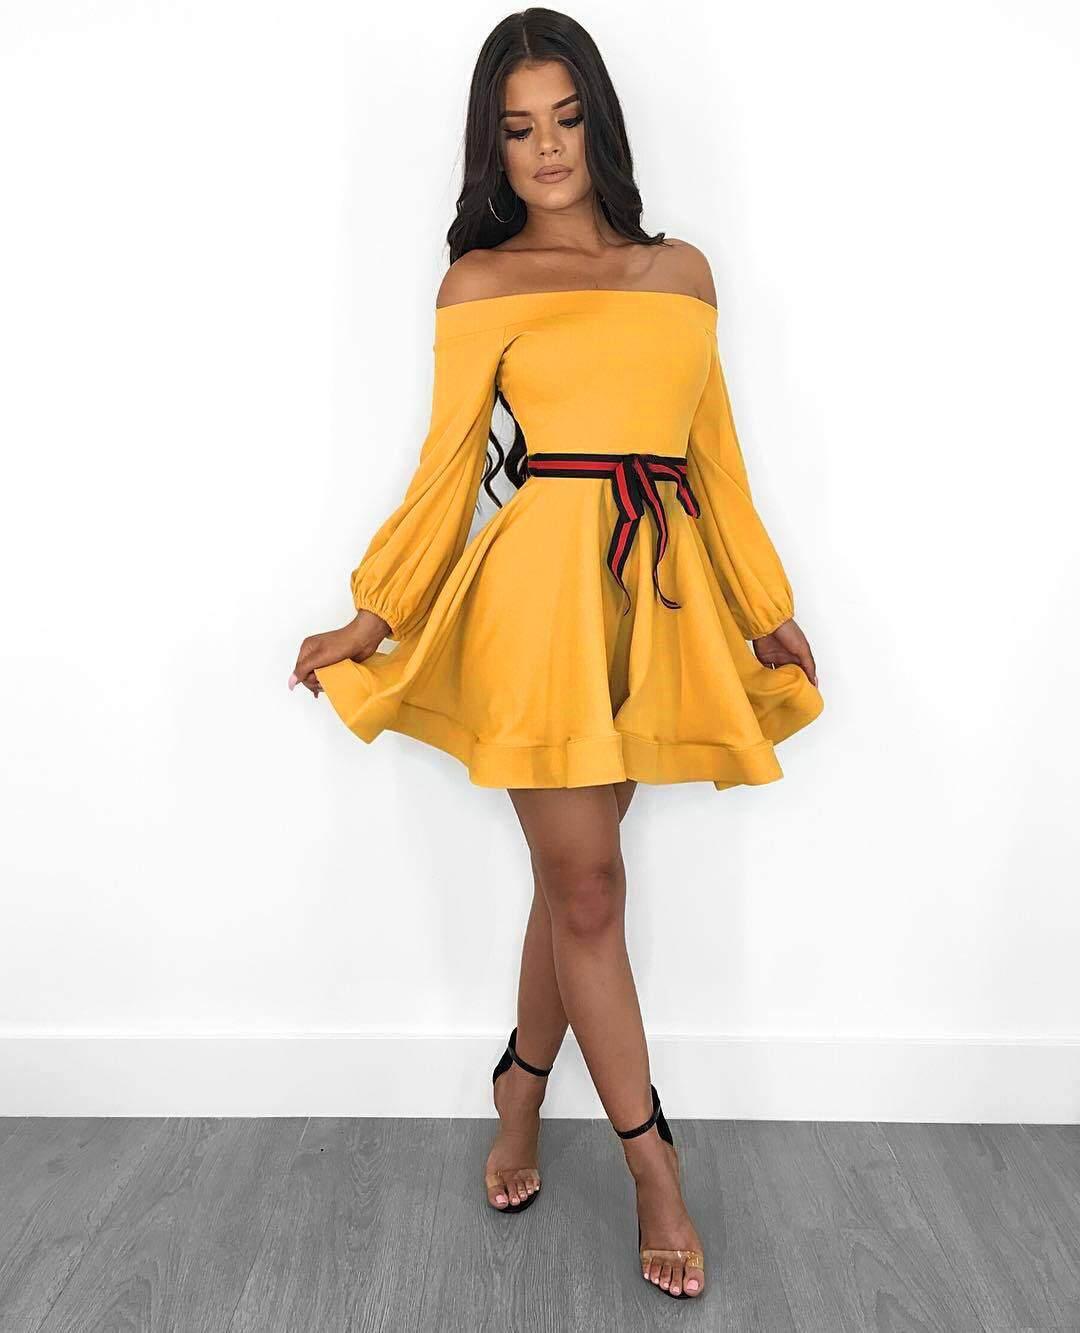 8285995c8c75 China. European and American Hot Women's Dresses Sexy Word Neck Trim Waist  Dress